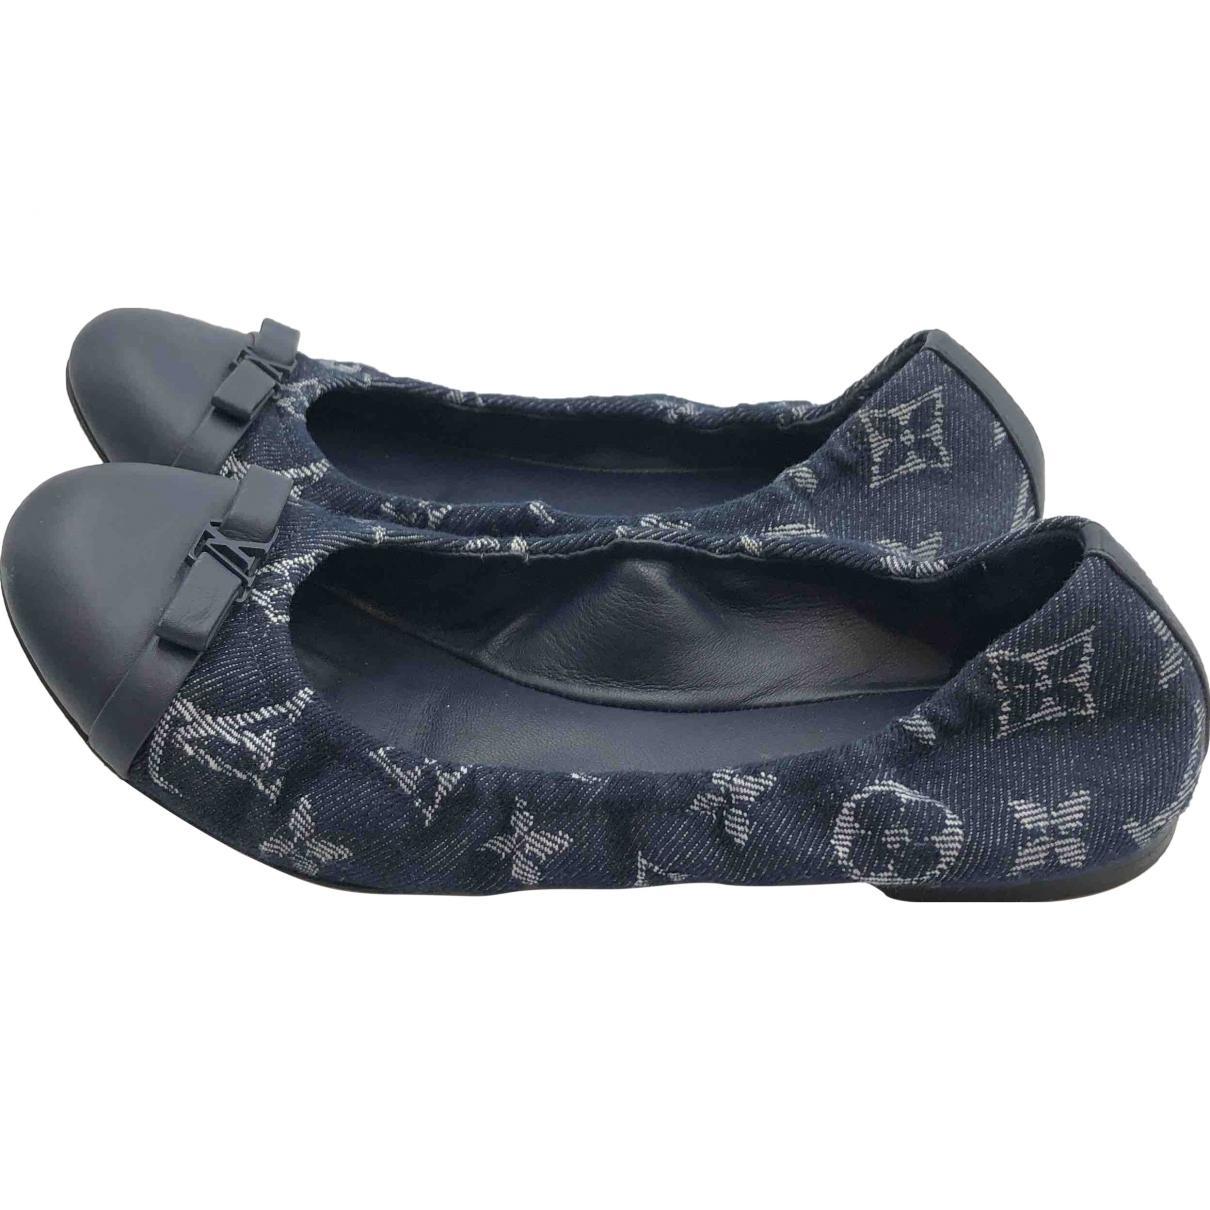 b621146e1863 Lyst - Louis Vuitton Other Cloth Ballet Flats in Blue